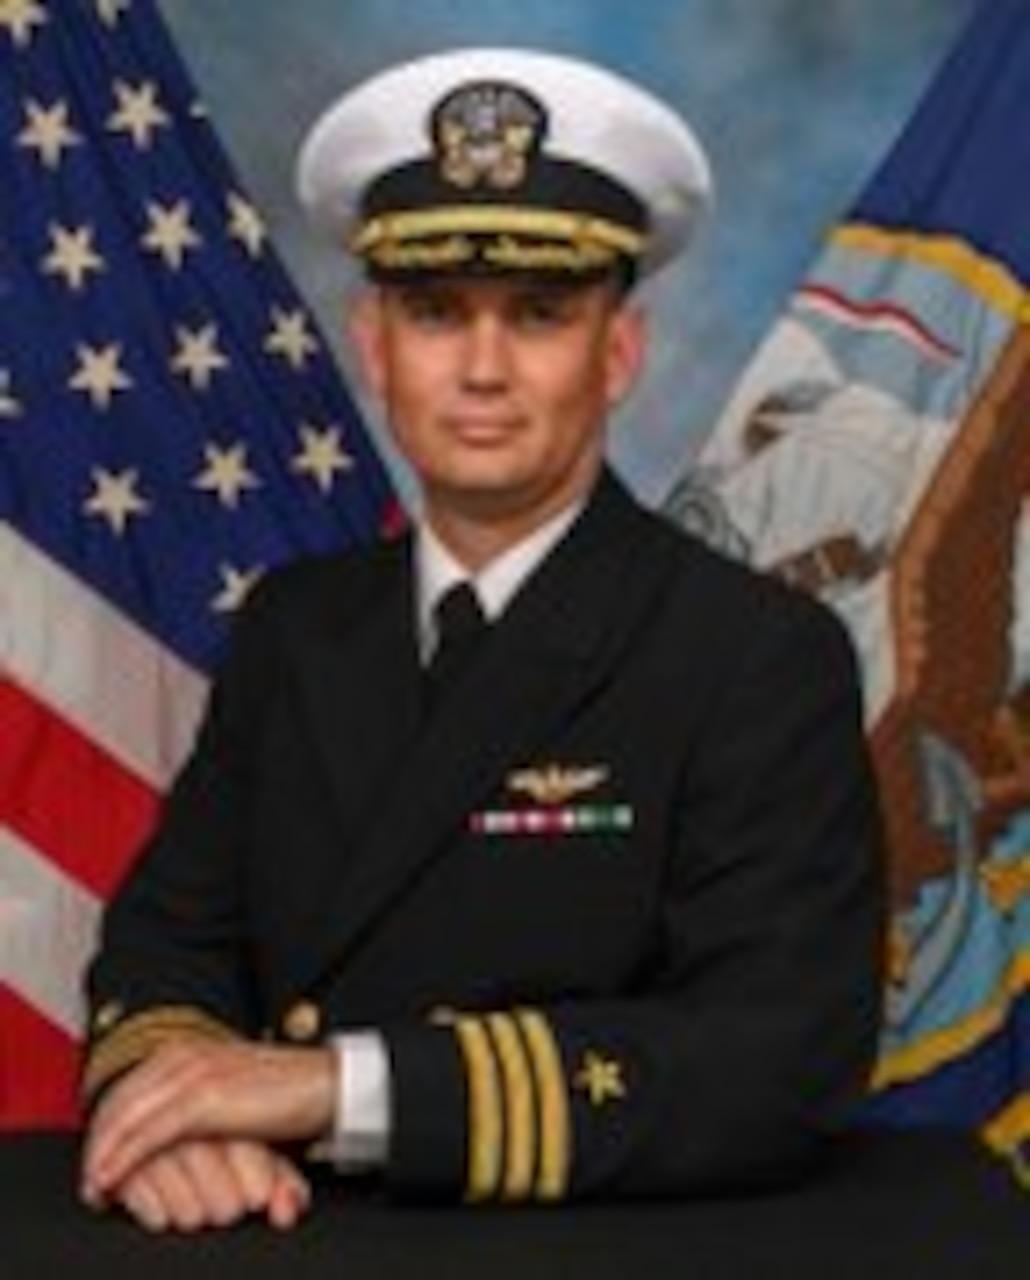 Commander Matthew Fountain